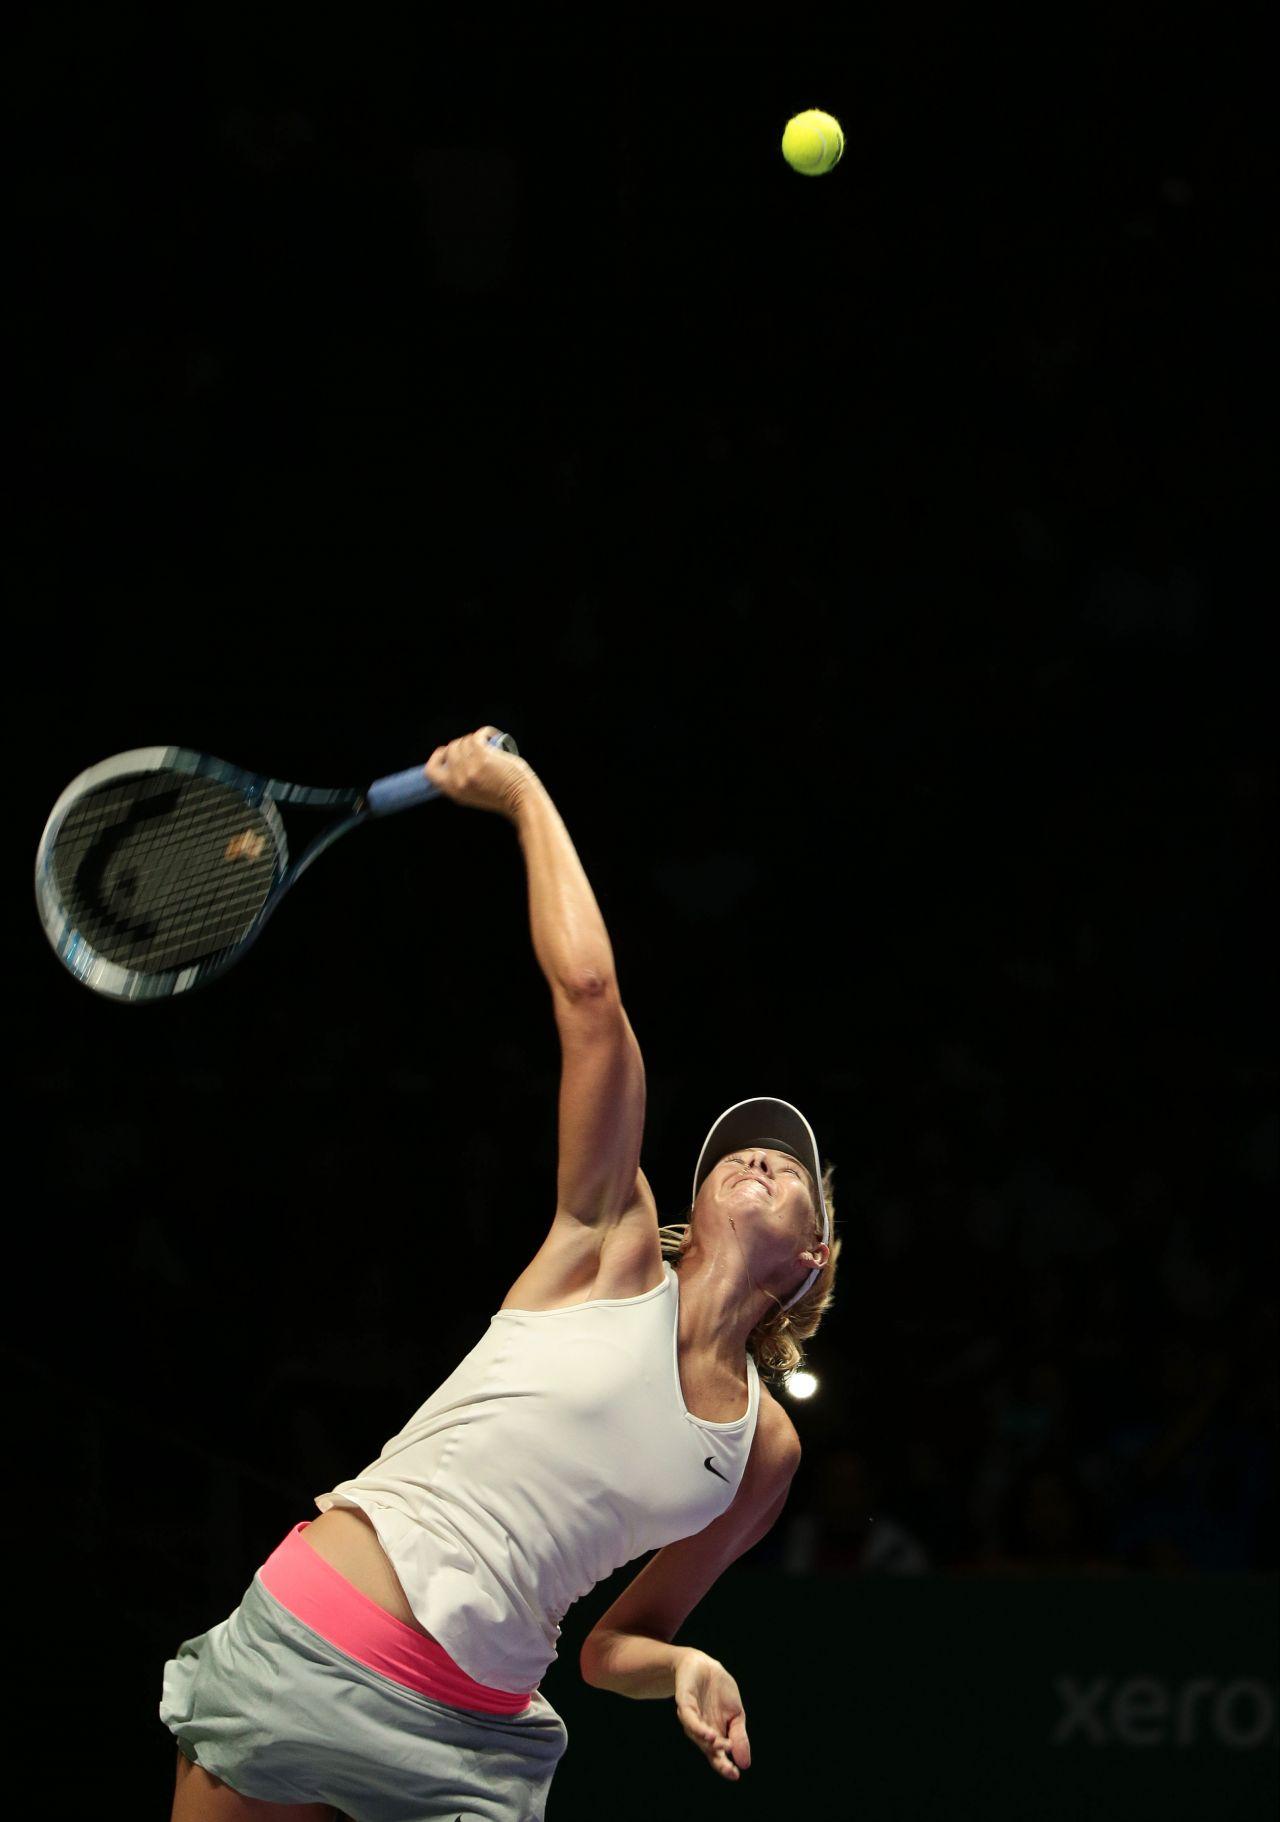 Maria Sharapova – 2014 WTA Finals in Singapore (vs Caroline Wozniacki)